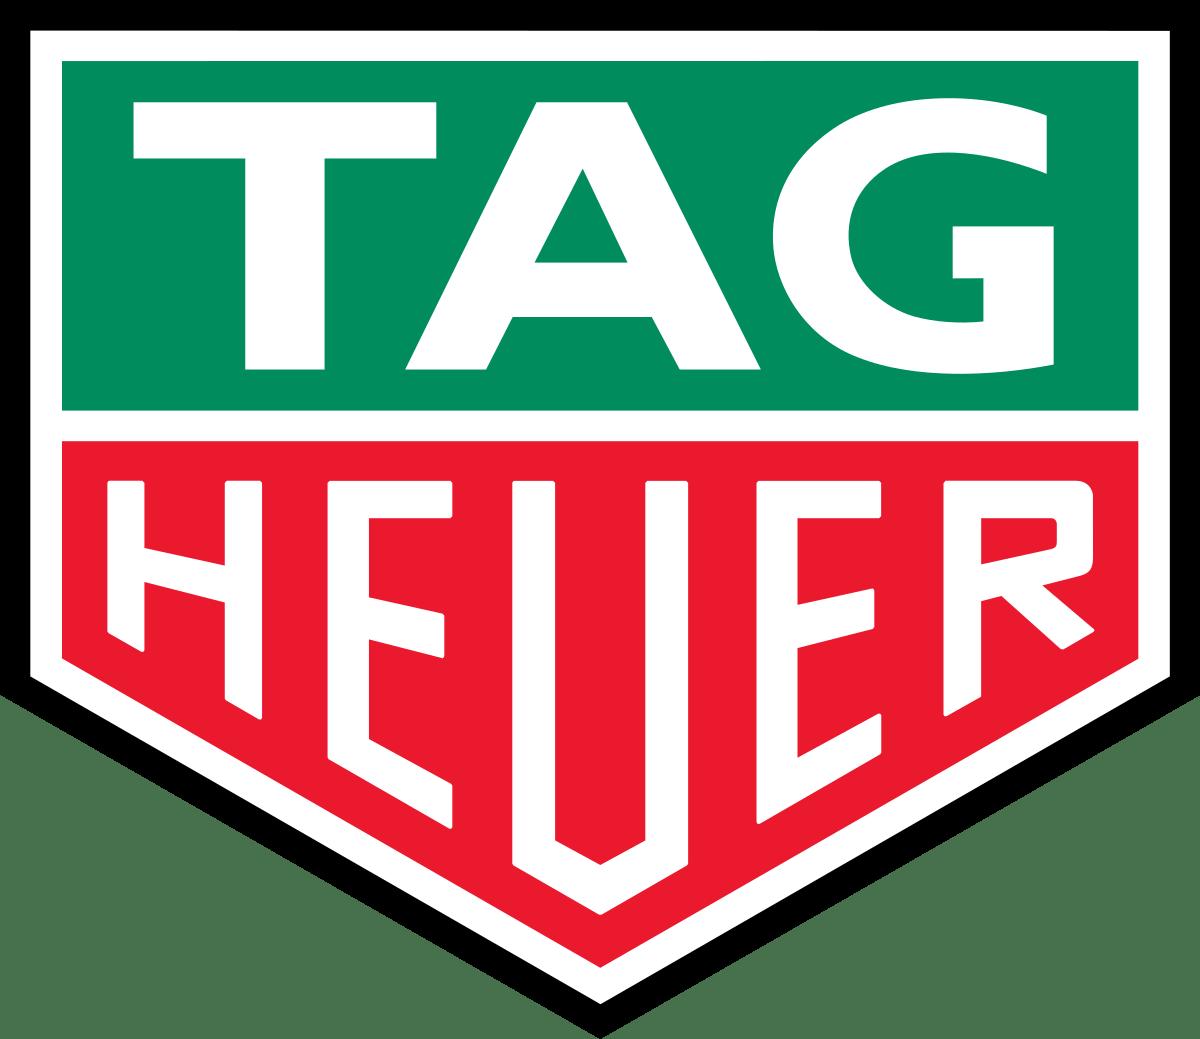 Heuer_Logo_transparent